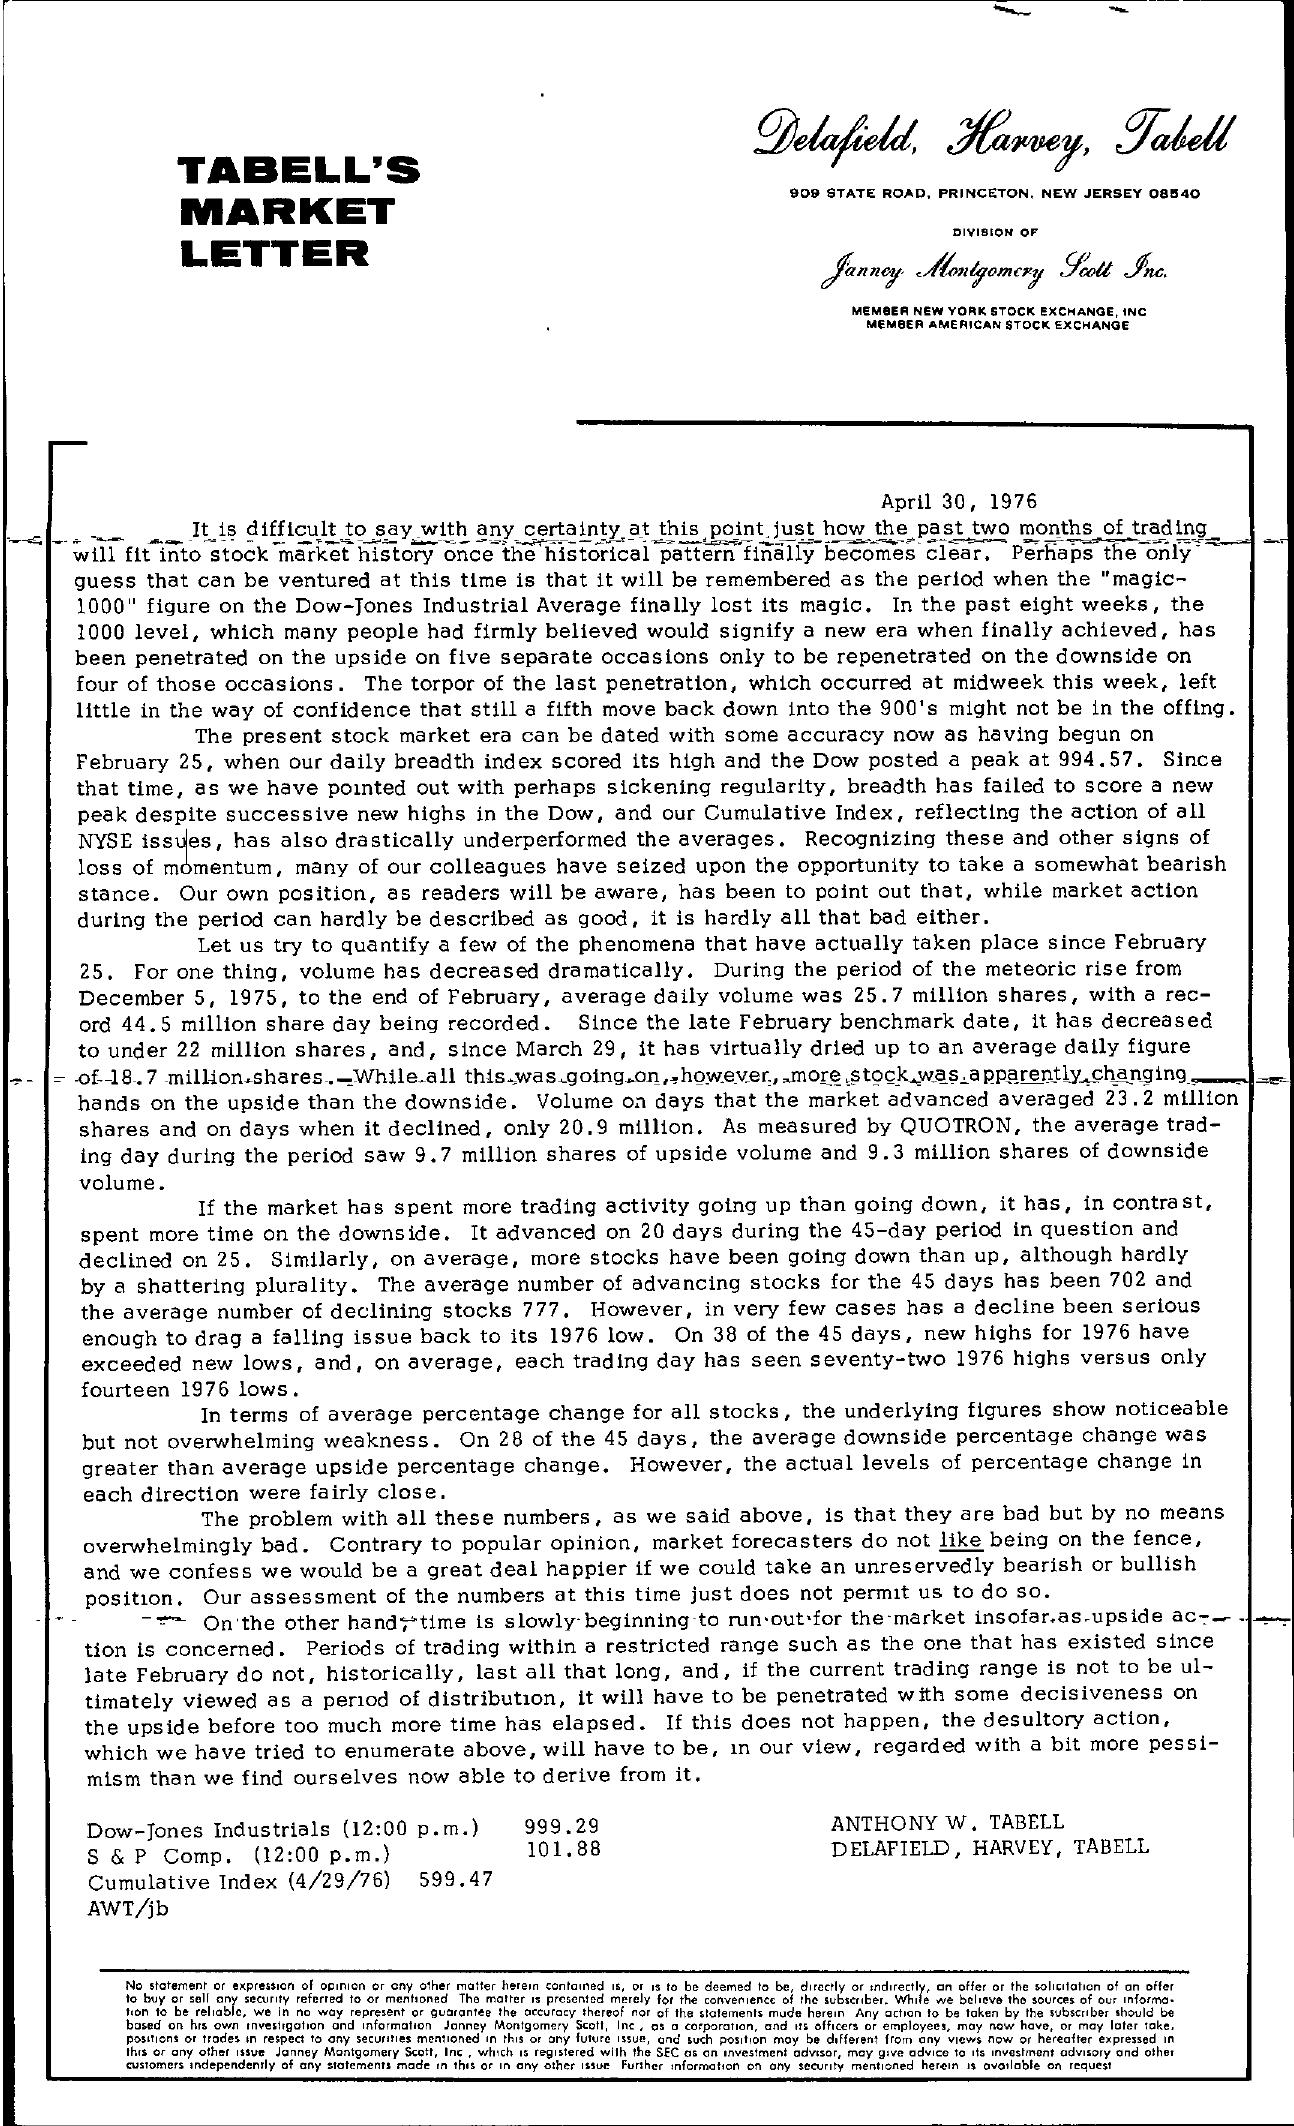 Tabell's Market Letter - April 30, 1976